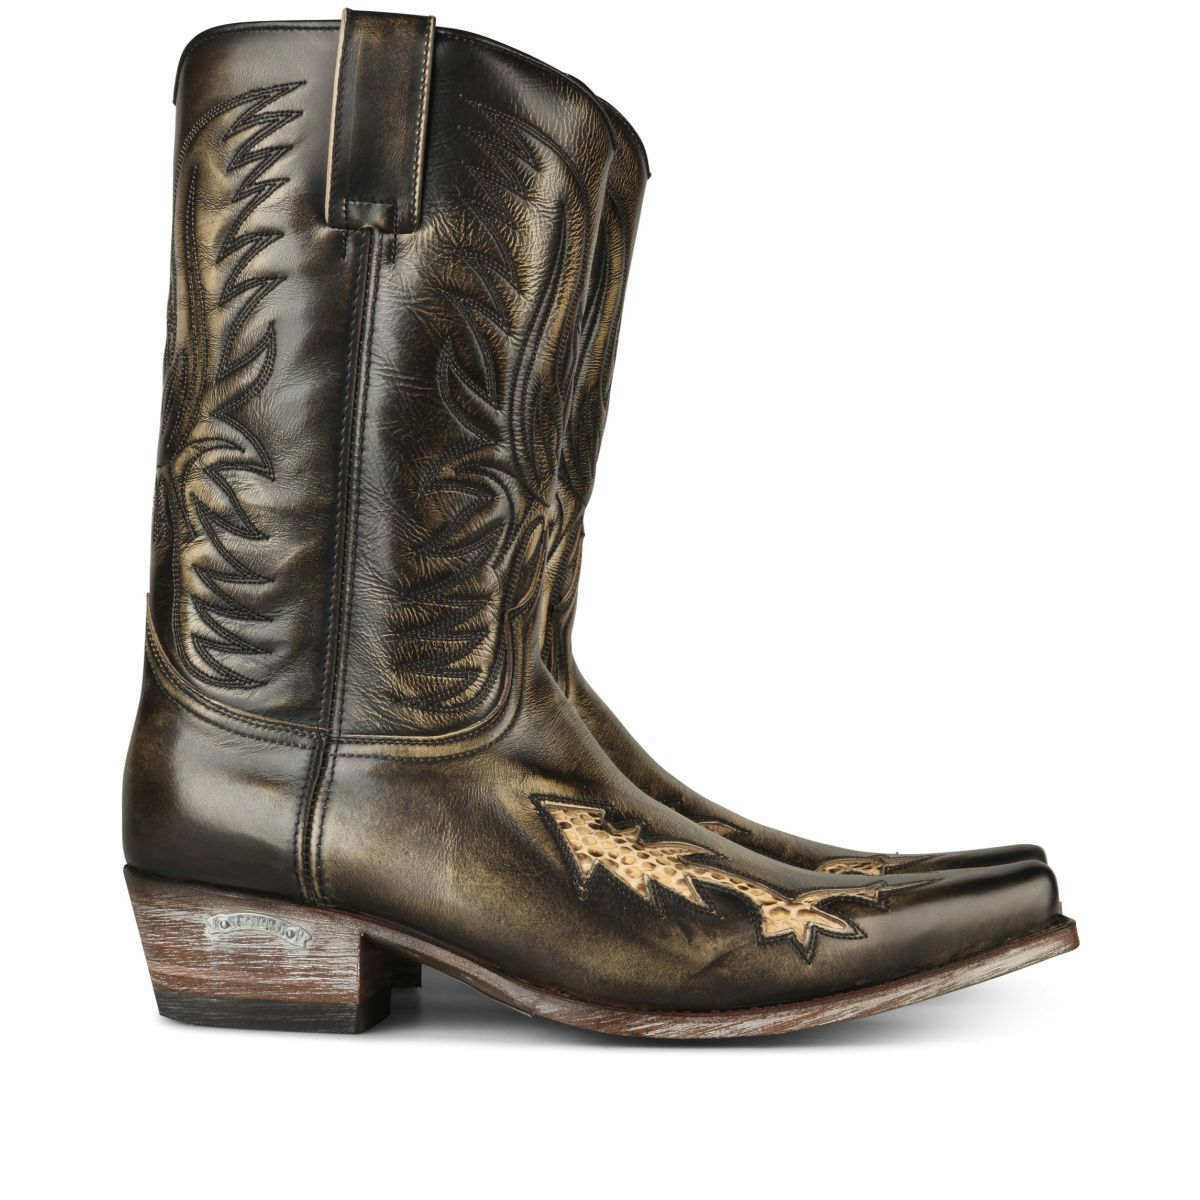 Sendra 9393 denver tiera: Gave western boots 9393 uit de